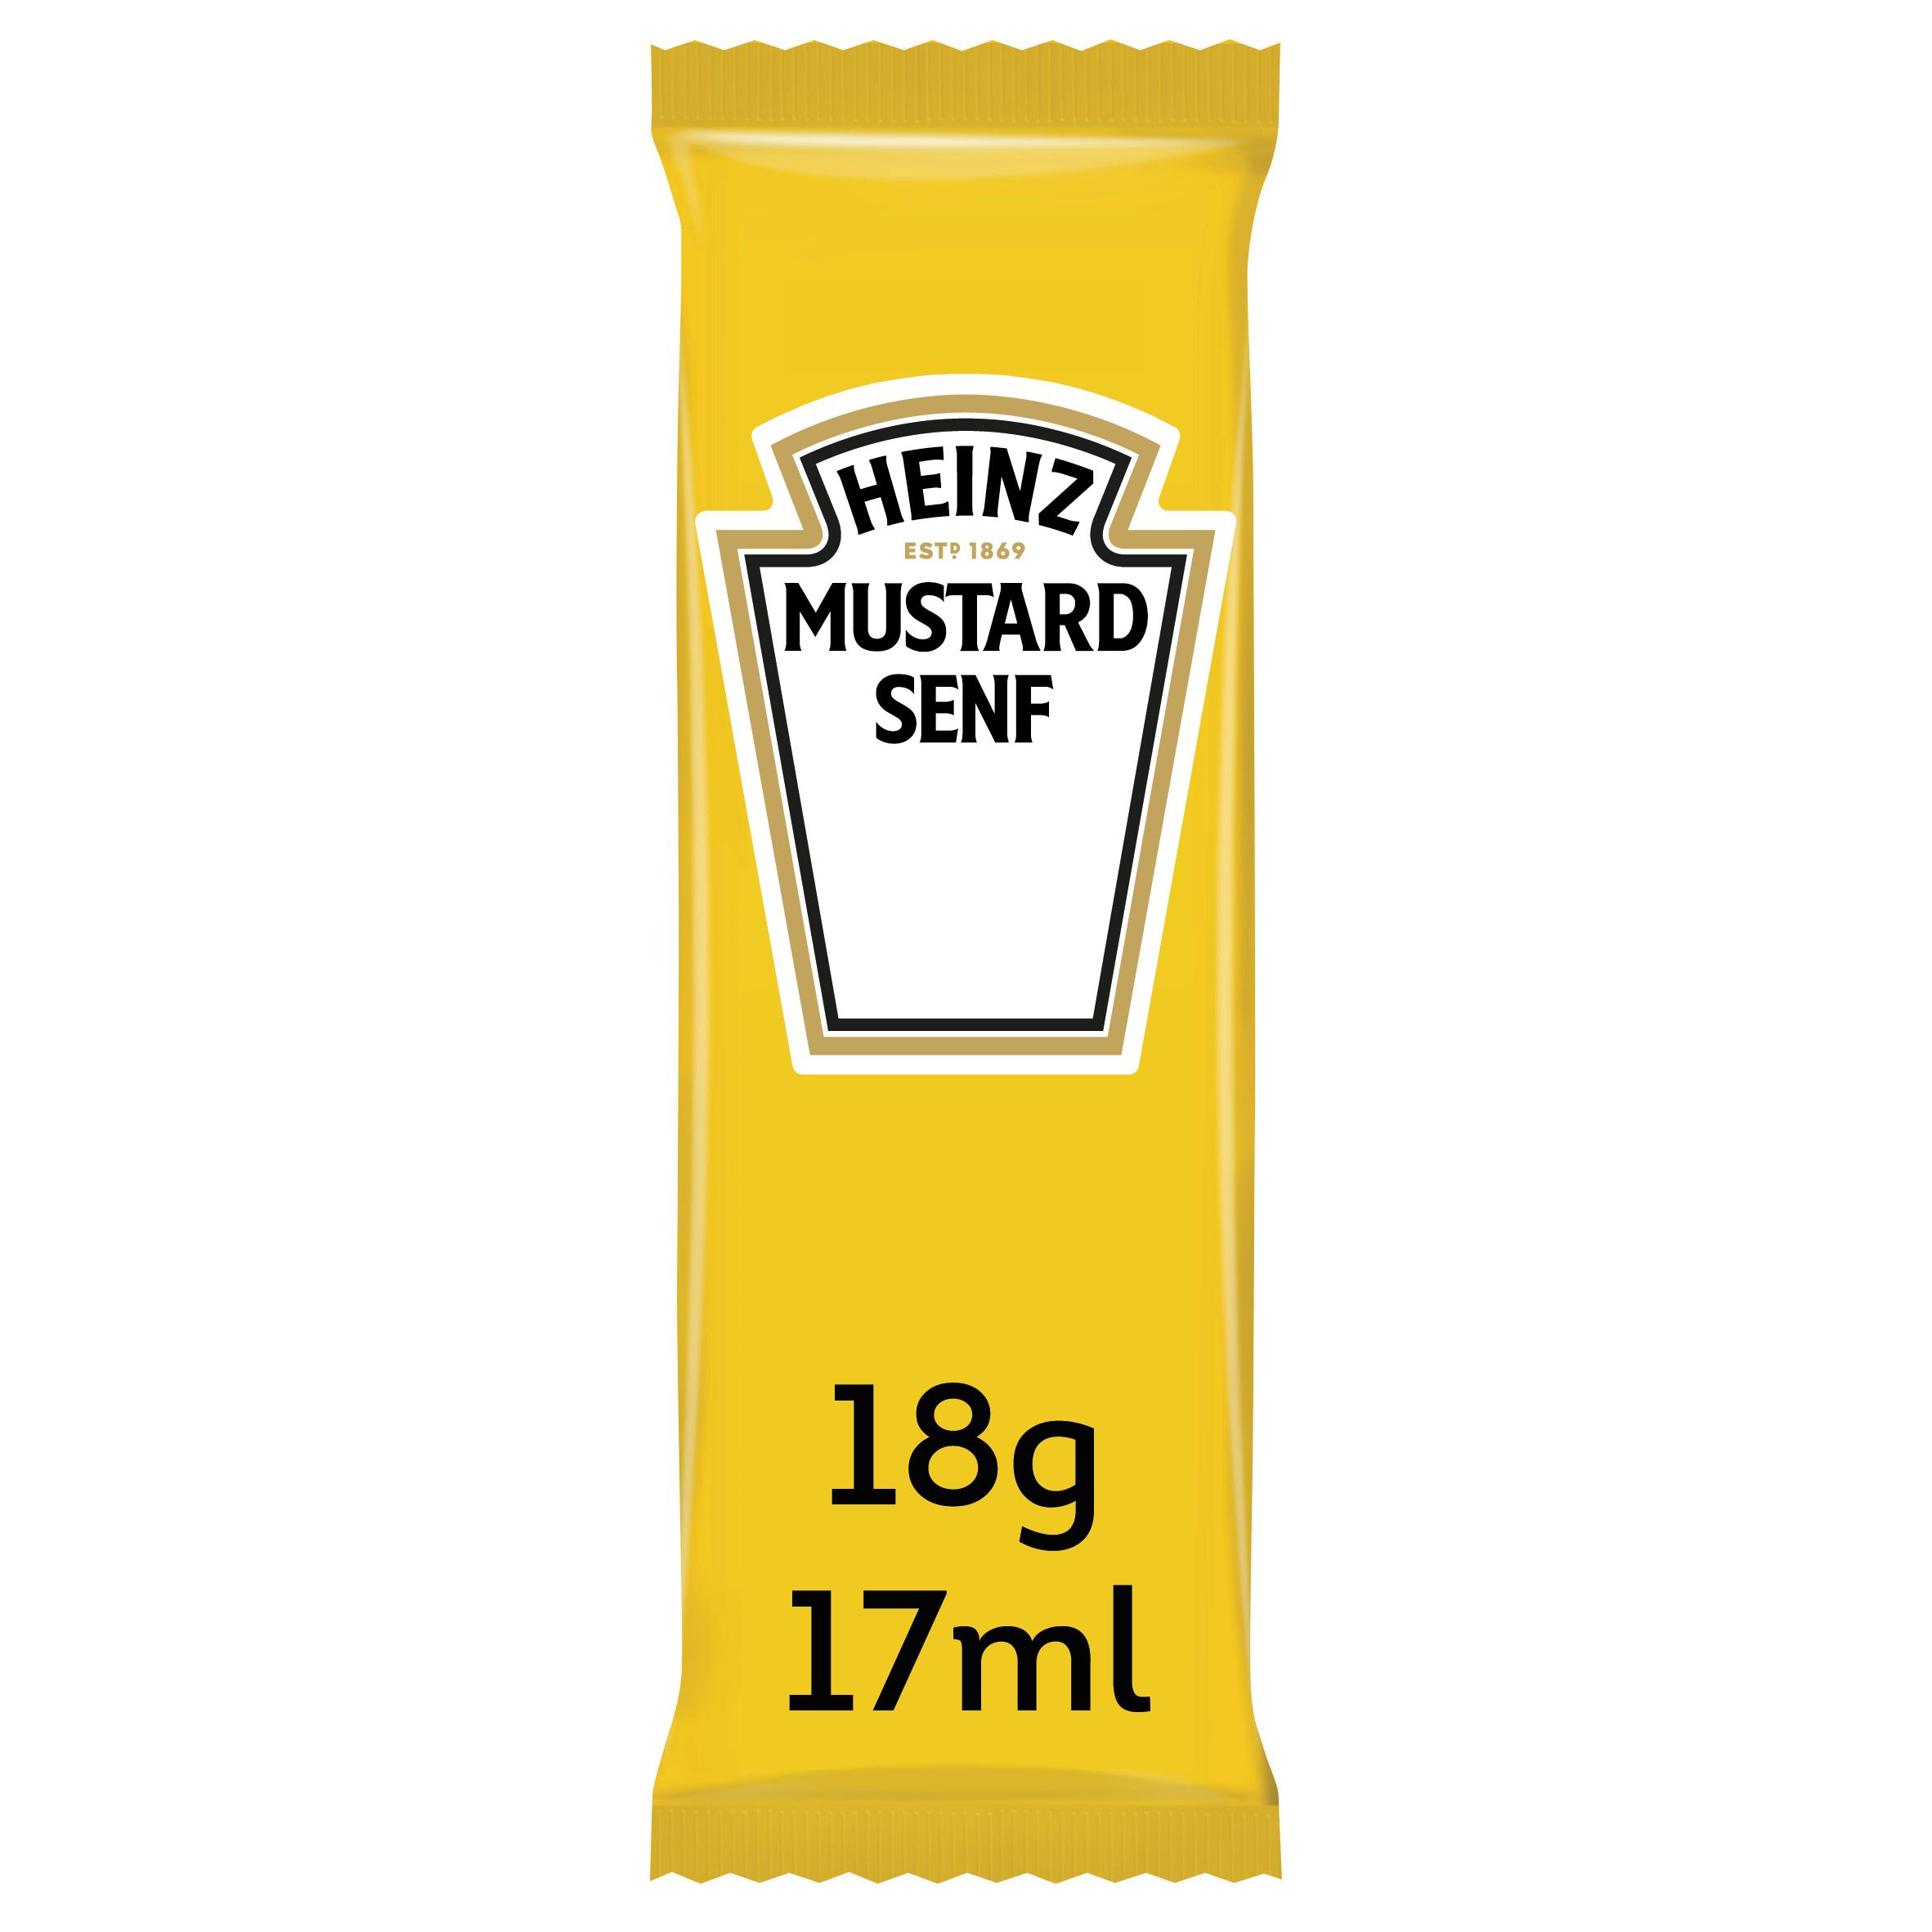 Heinz Mustard 17ml Sachet image